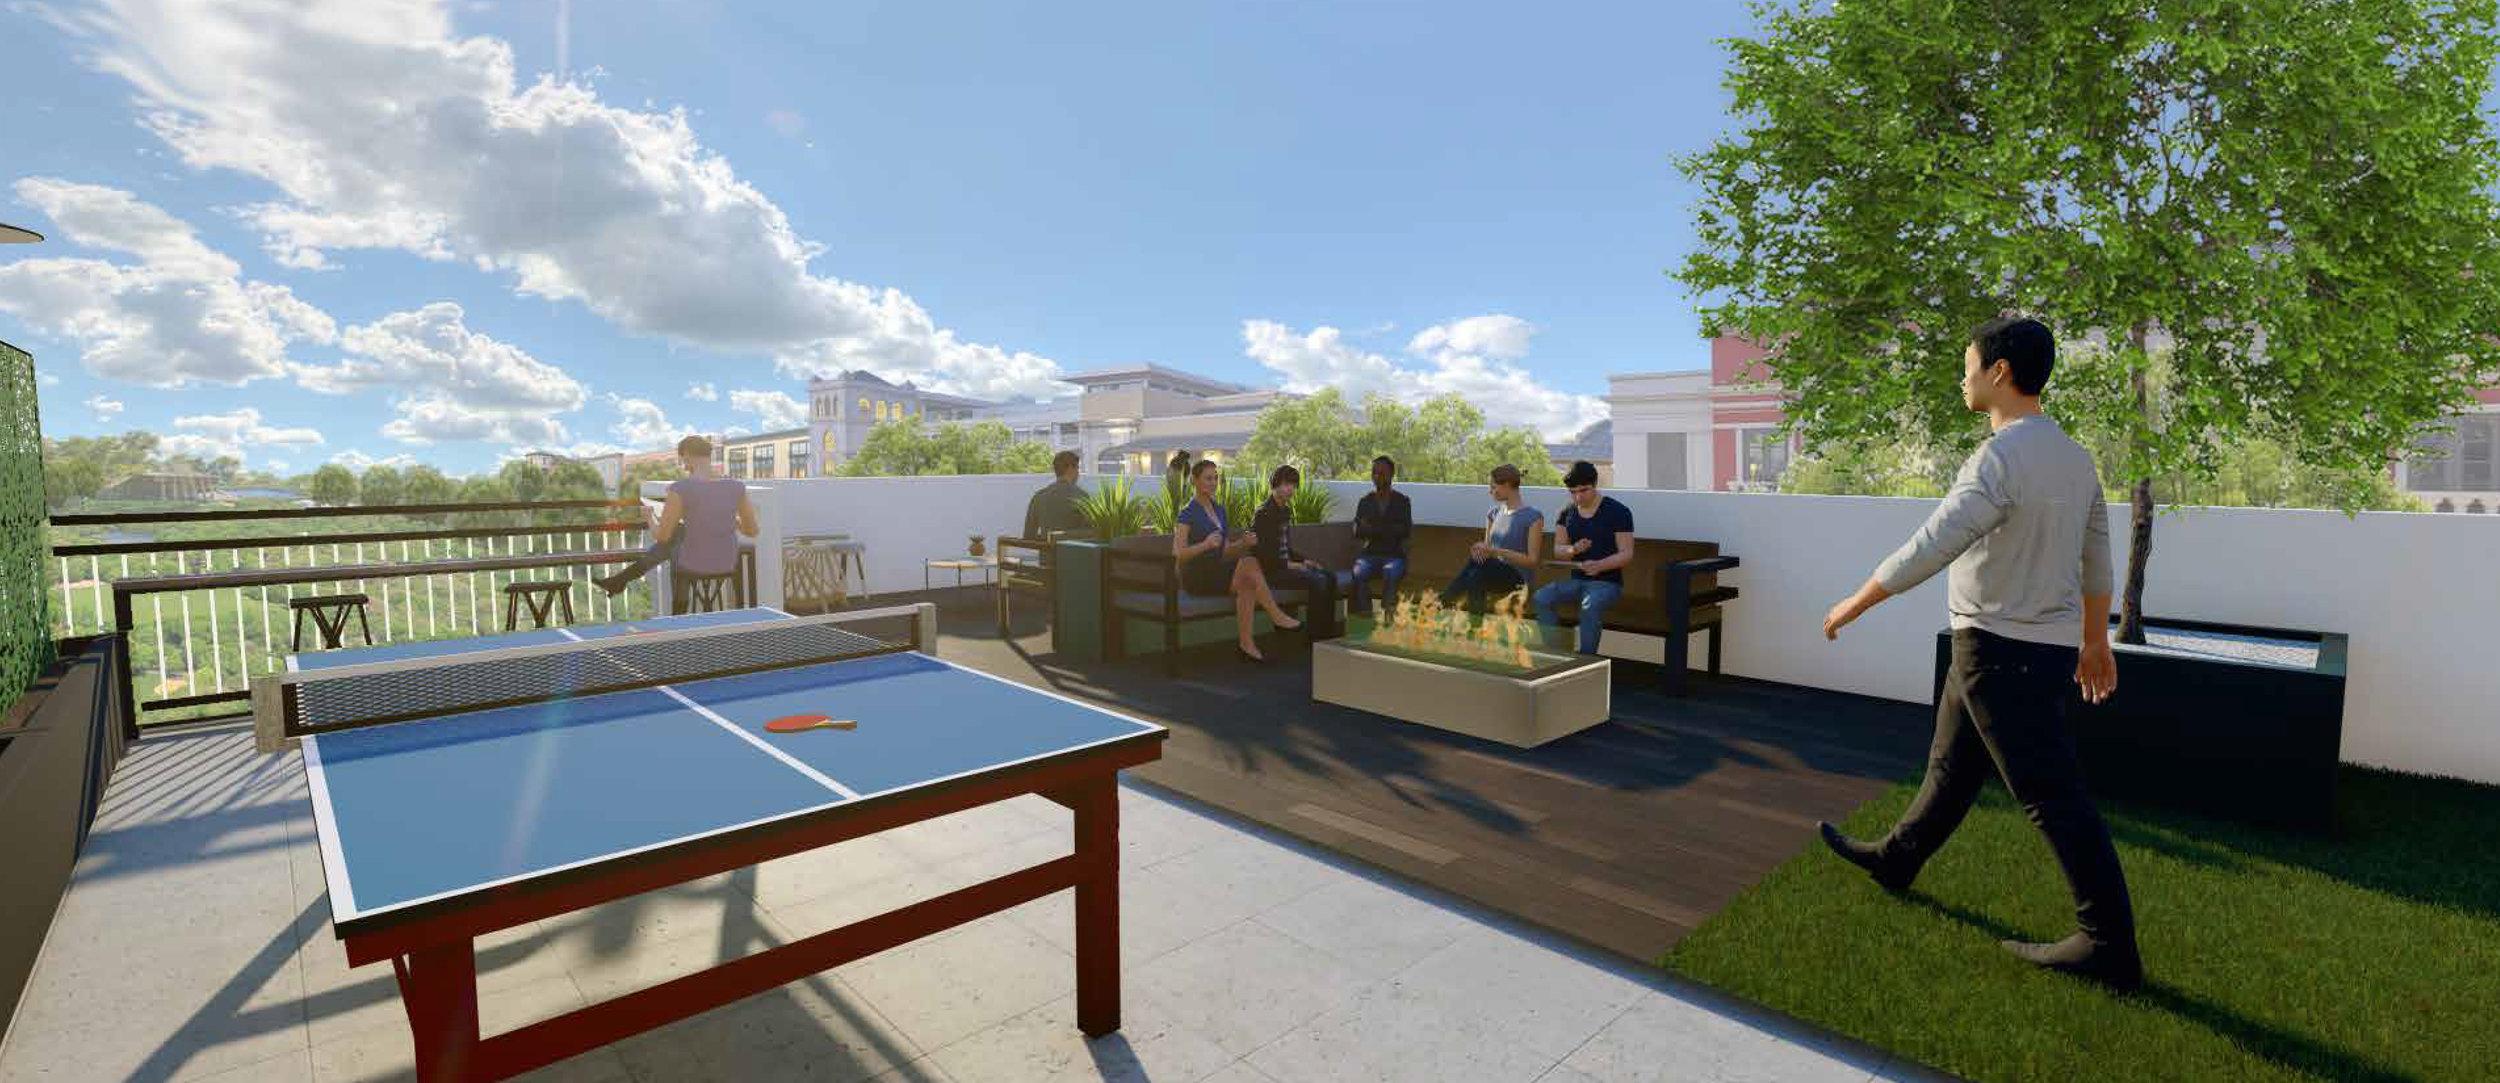 Roof Terrace | Firepit Lounge